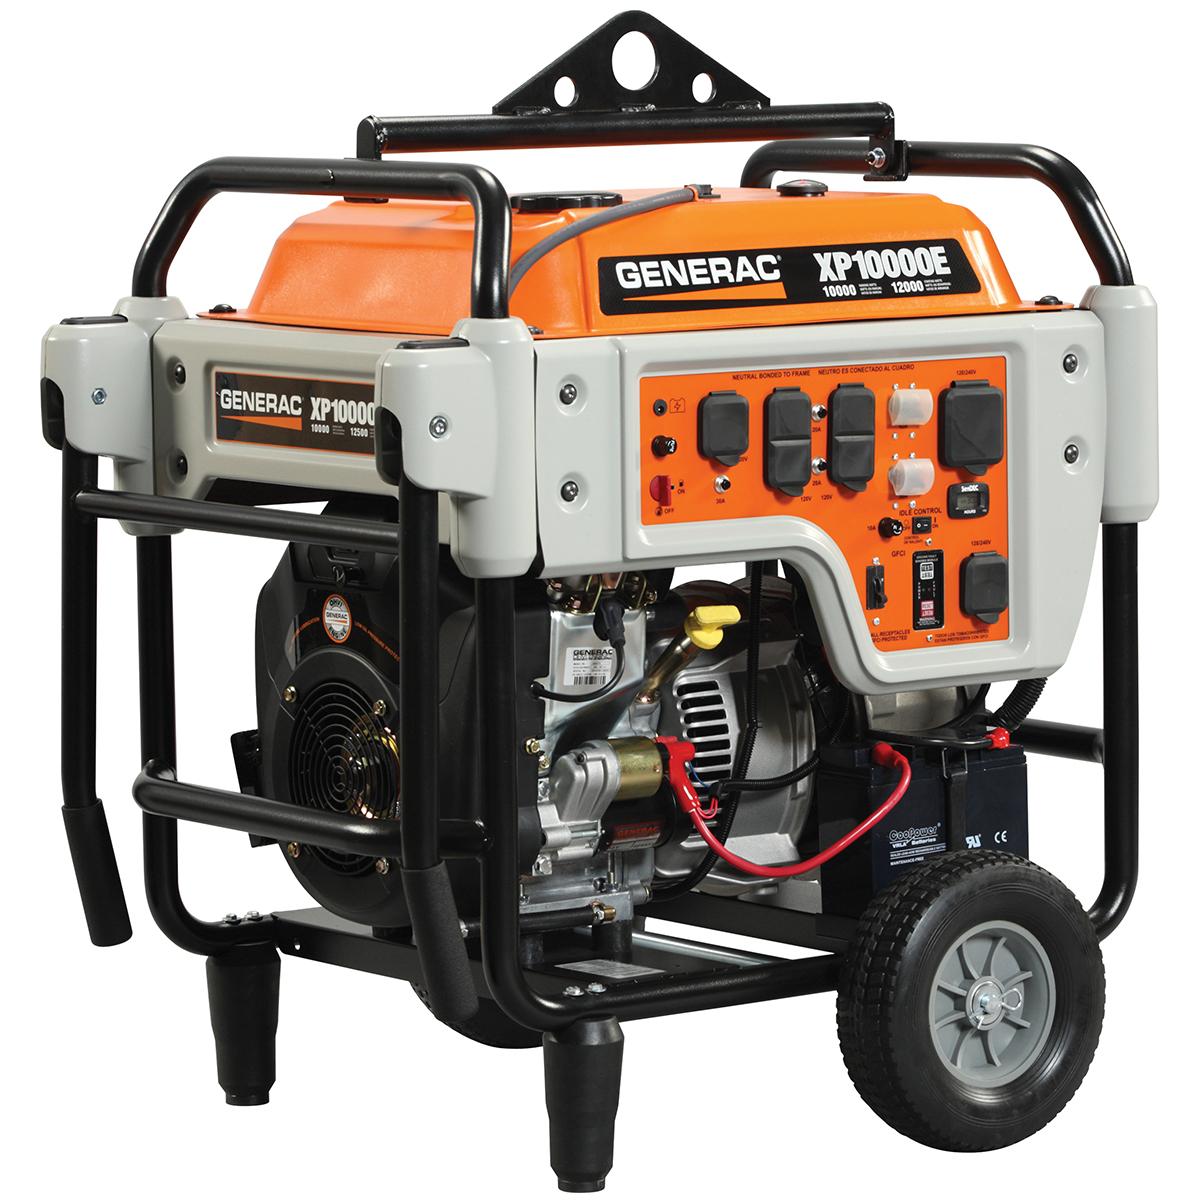 generac 5932 xp10000e 10 000 watt electric start gas